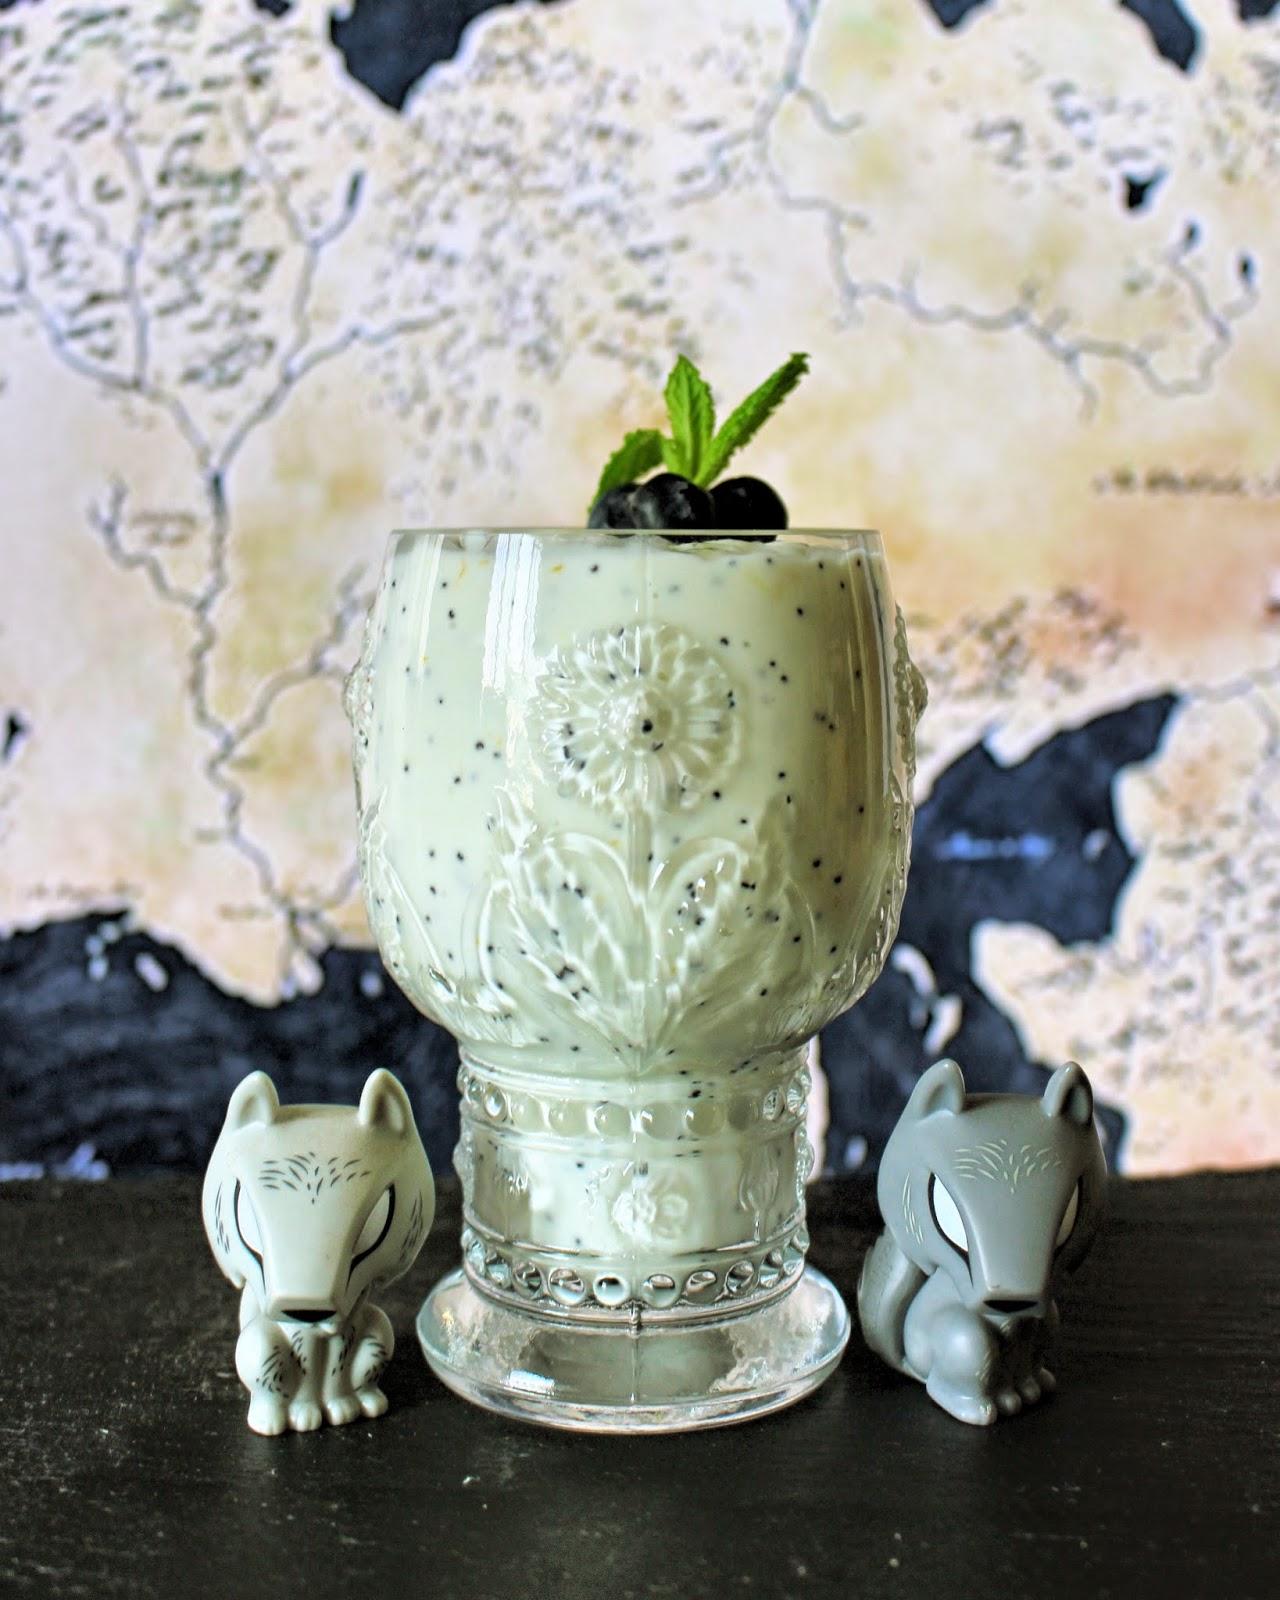 Game of Thrones Milk of the Poppy Panna Cotta